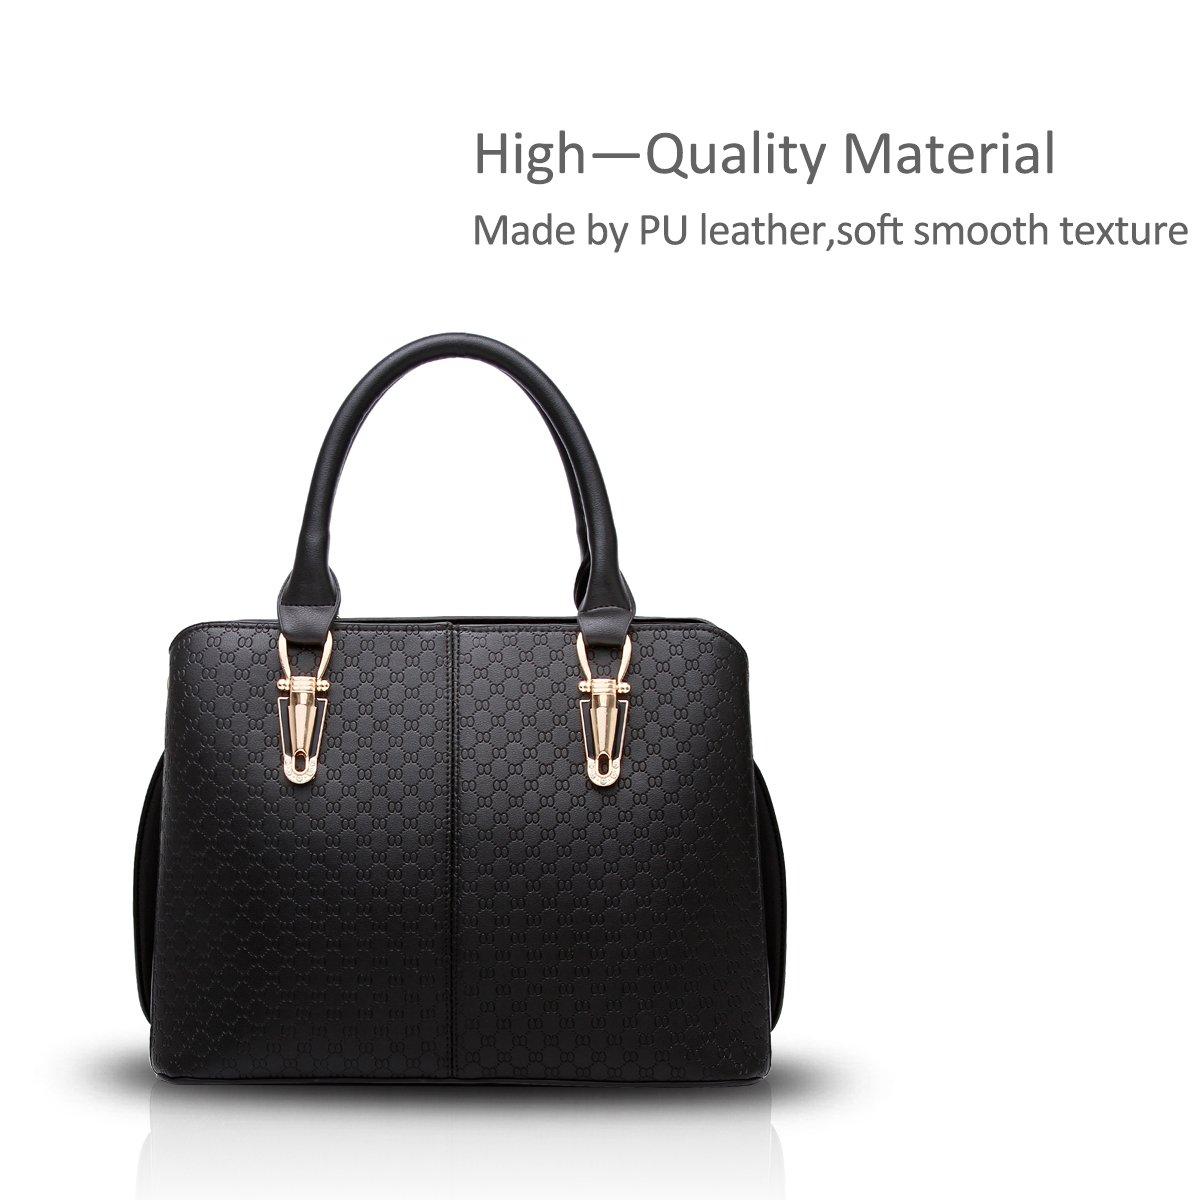 Nicole Doris Fashion Women Handbag Large Bag Retro Handbags Casual Shoulder  Bag Messenger Bag for Women Black  Amazon.co.uk  Shoes   Bags a7839f1d7e